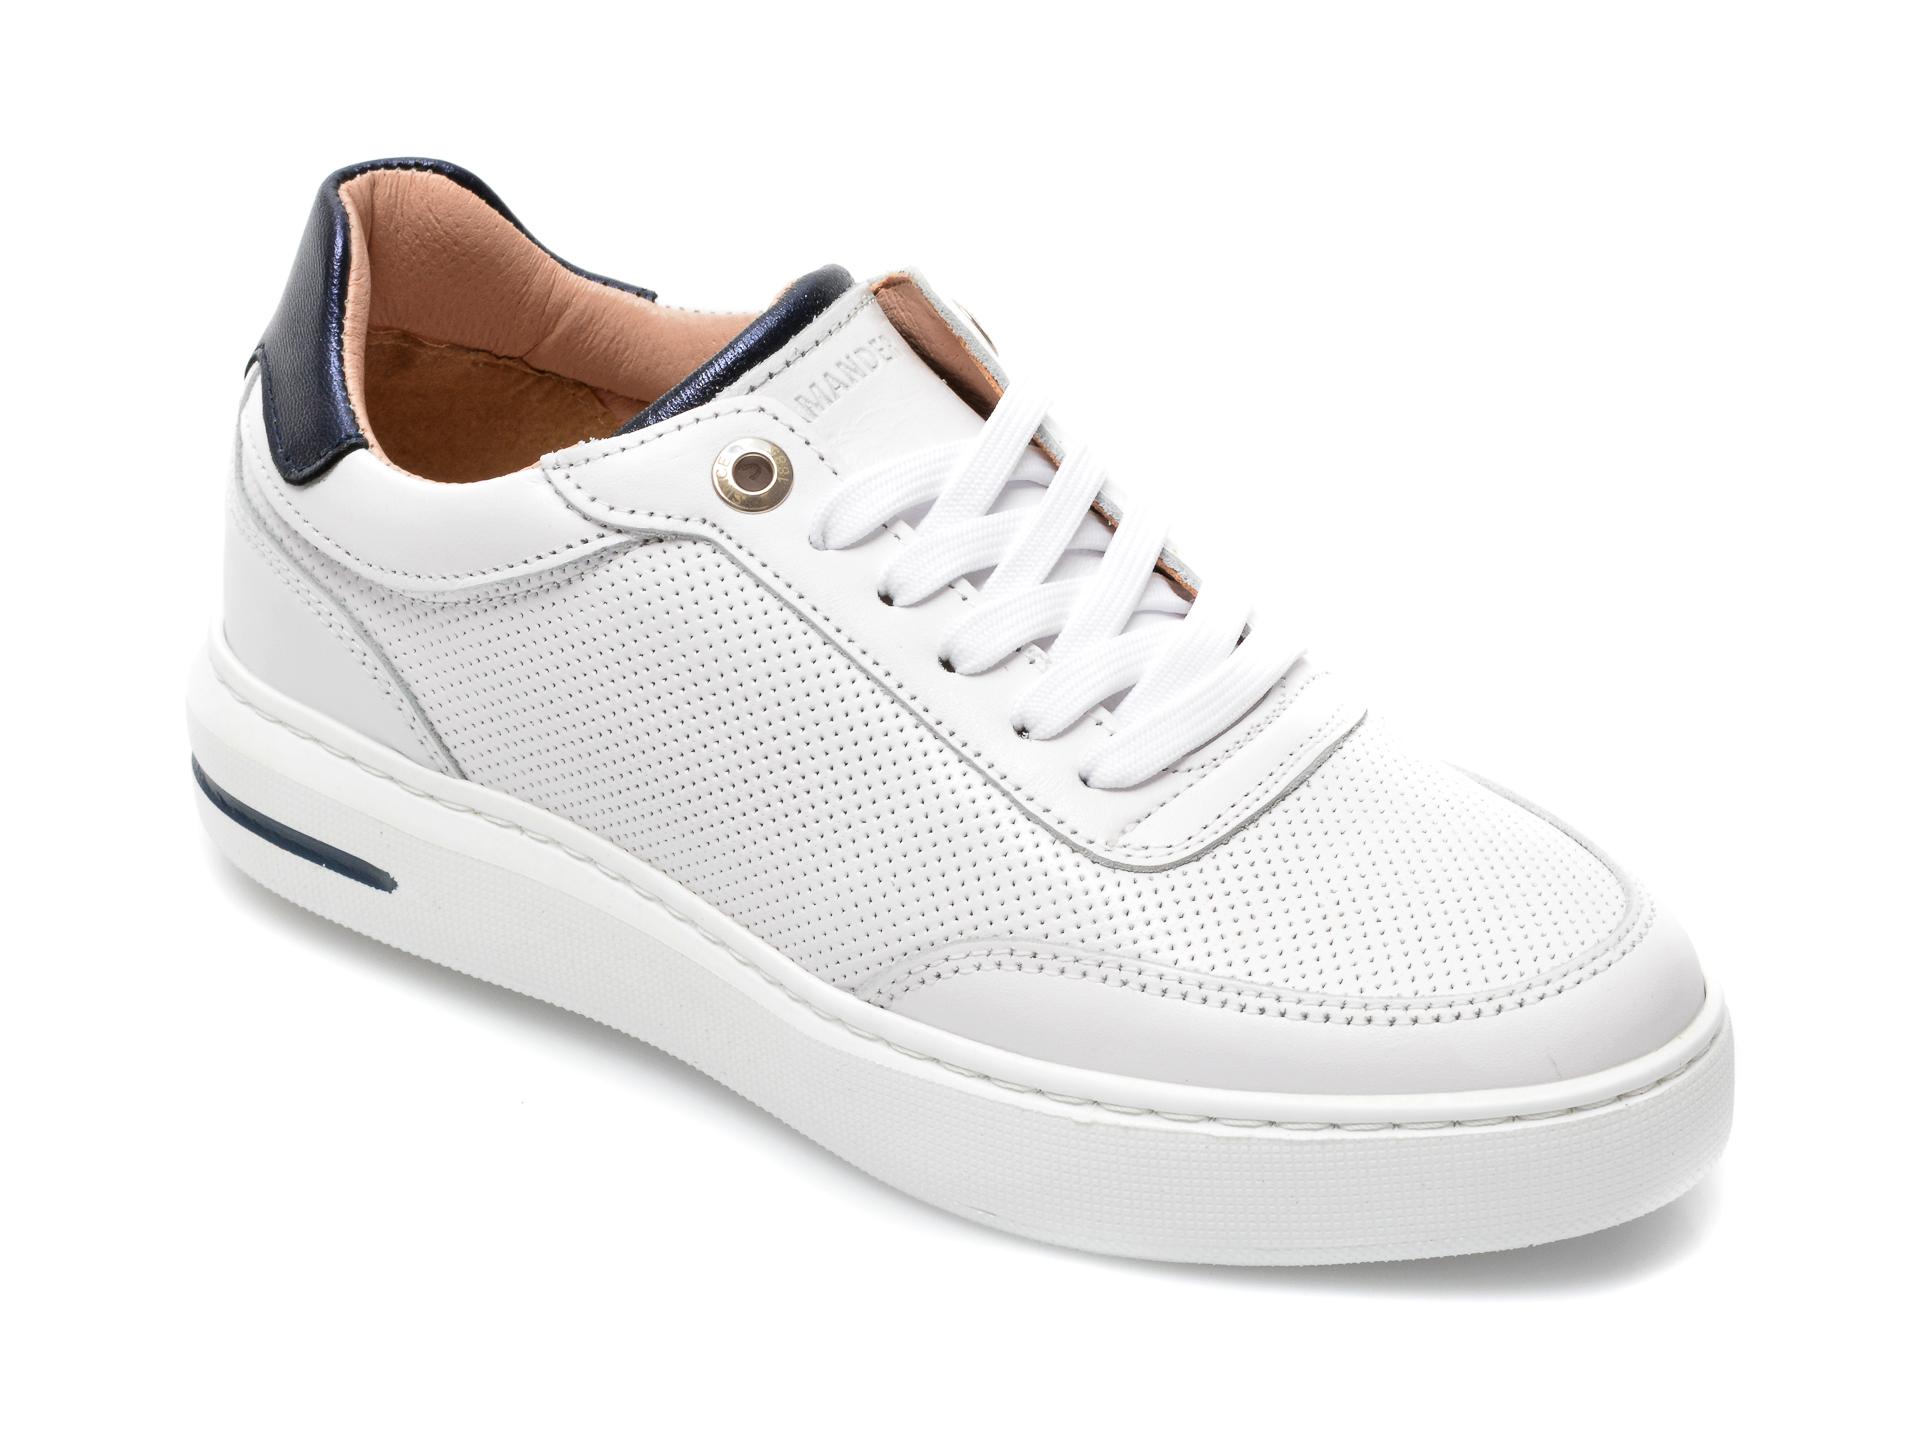 Pantofi sport SALAMANDER albi, 56903, din piele naturala imagine otter.ro 2021